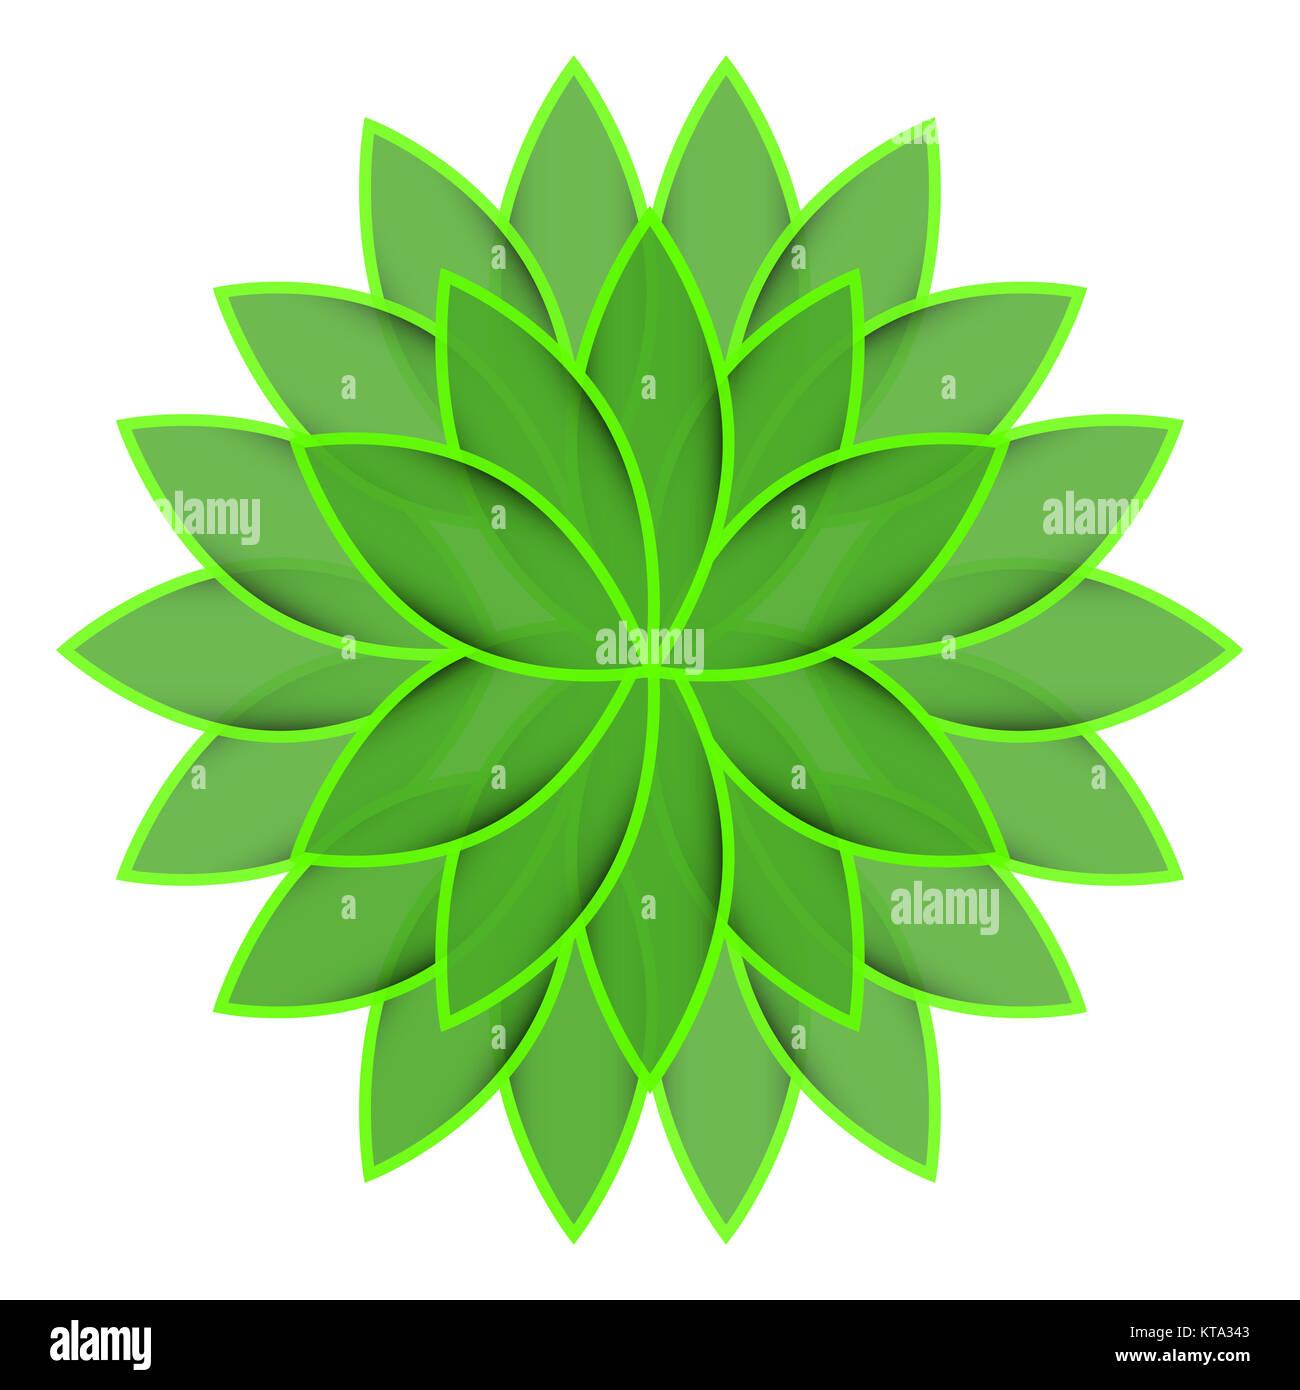 Set Of Colorful Yoga And Spa Logo Vector: Lotus Flower Vector Stock Photos & Lotus Flower Vector